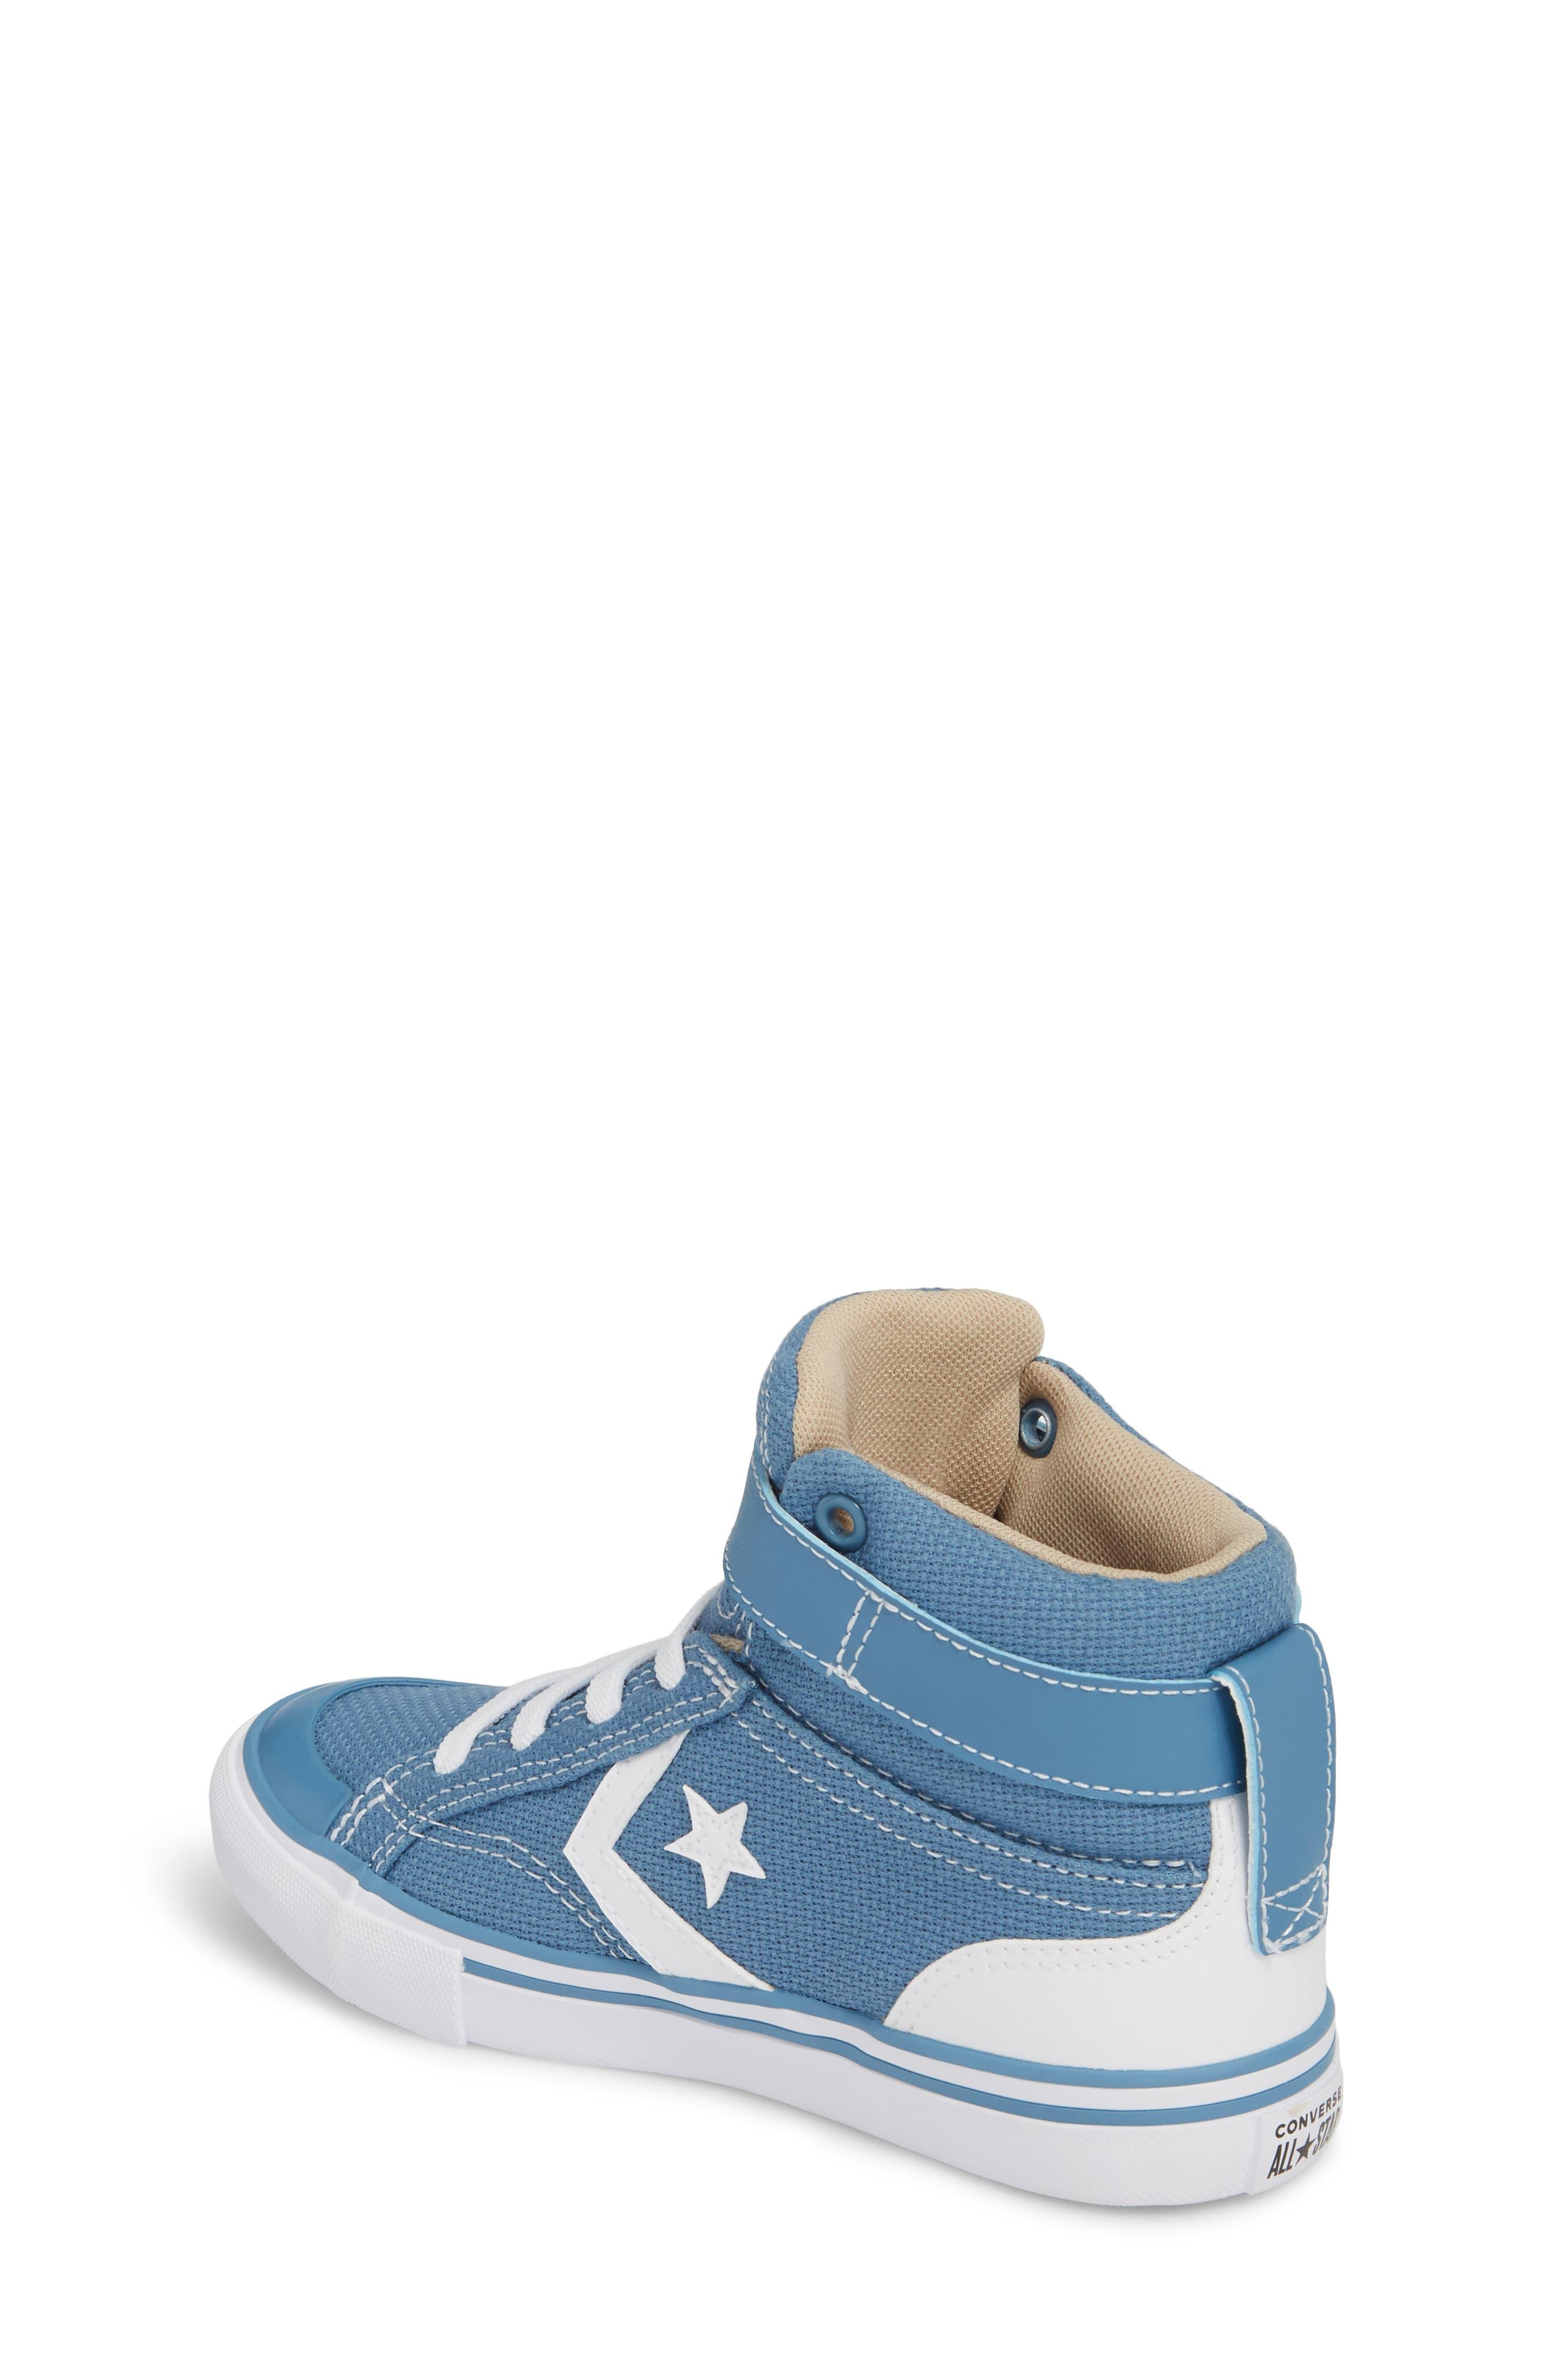 Pro Blaze High Top Sneaker,                             Alternate thumbnail 3, color,